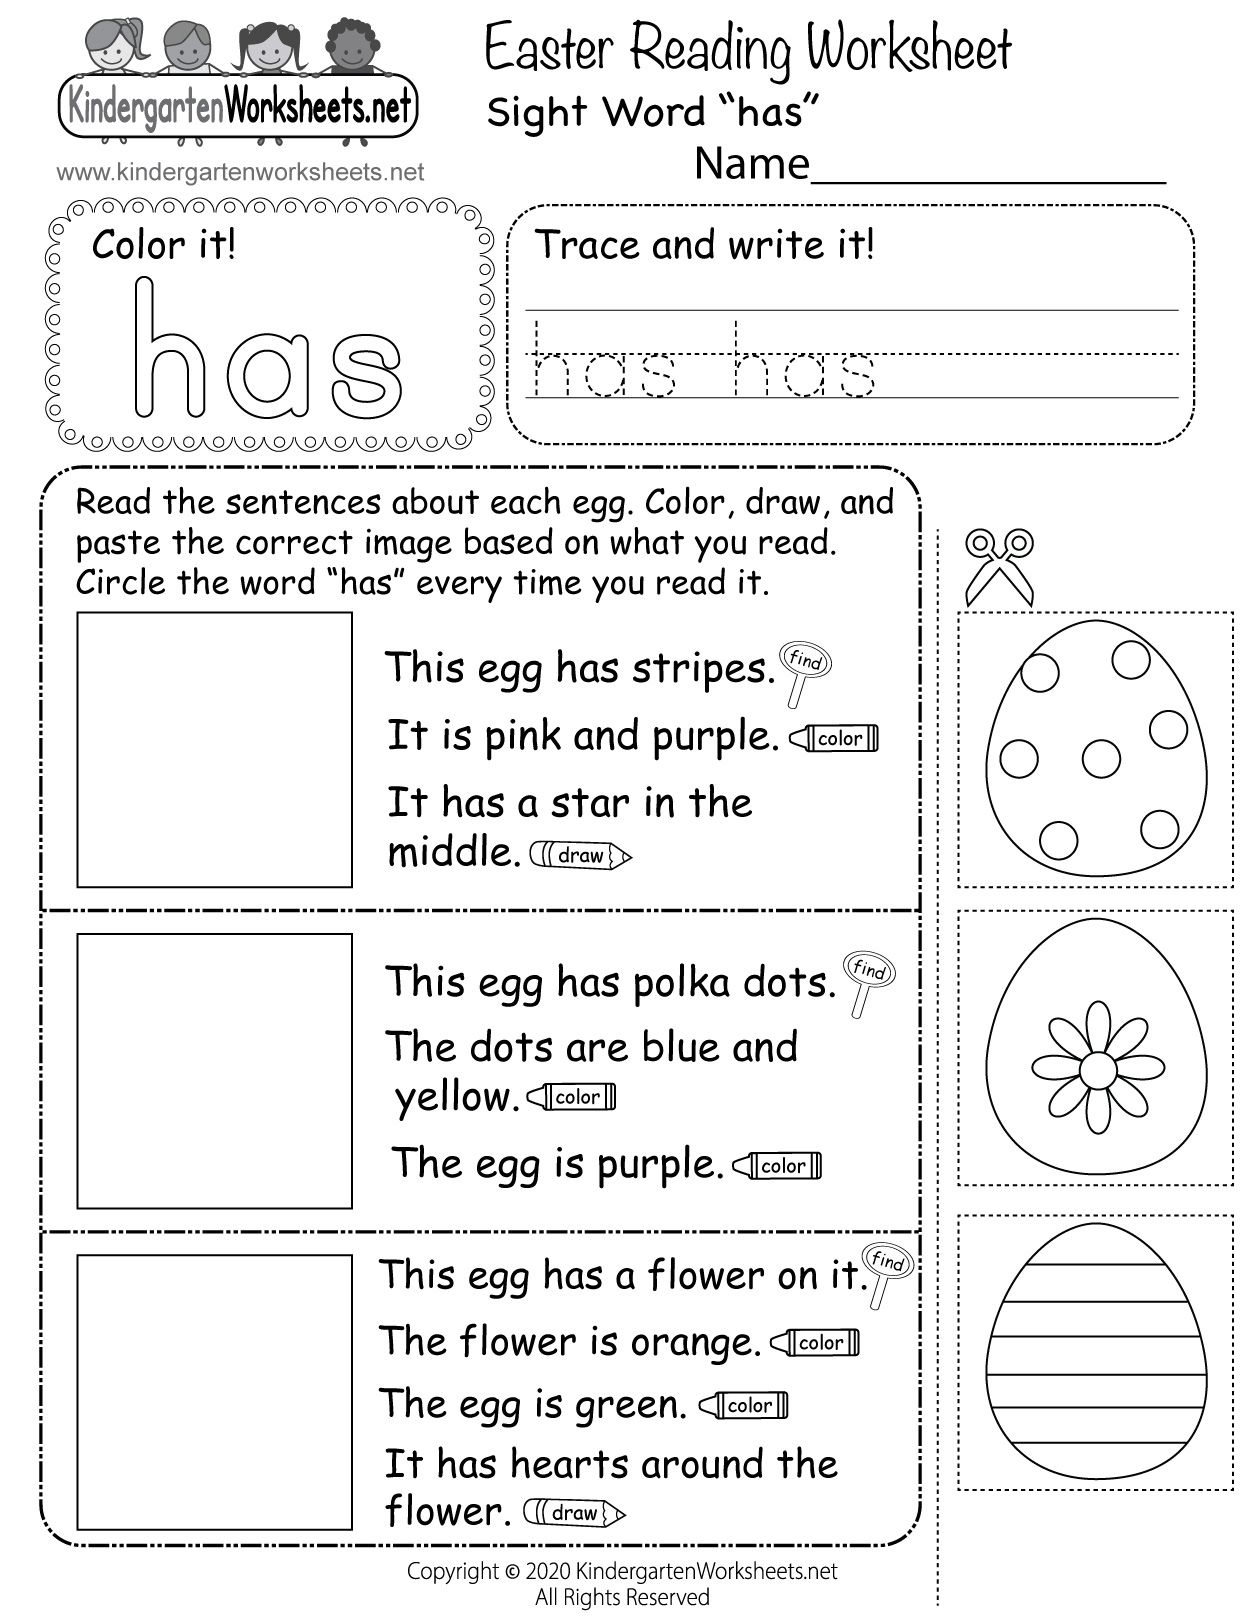 Kindergarten Easter Reading Worksheet In 2021 Reading Worksheets Kindergarten Spring Math Worksheets Kindergarten Reading Worksheets [ 1618 x 1250 Pixel ]